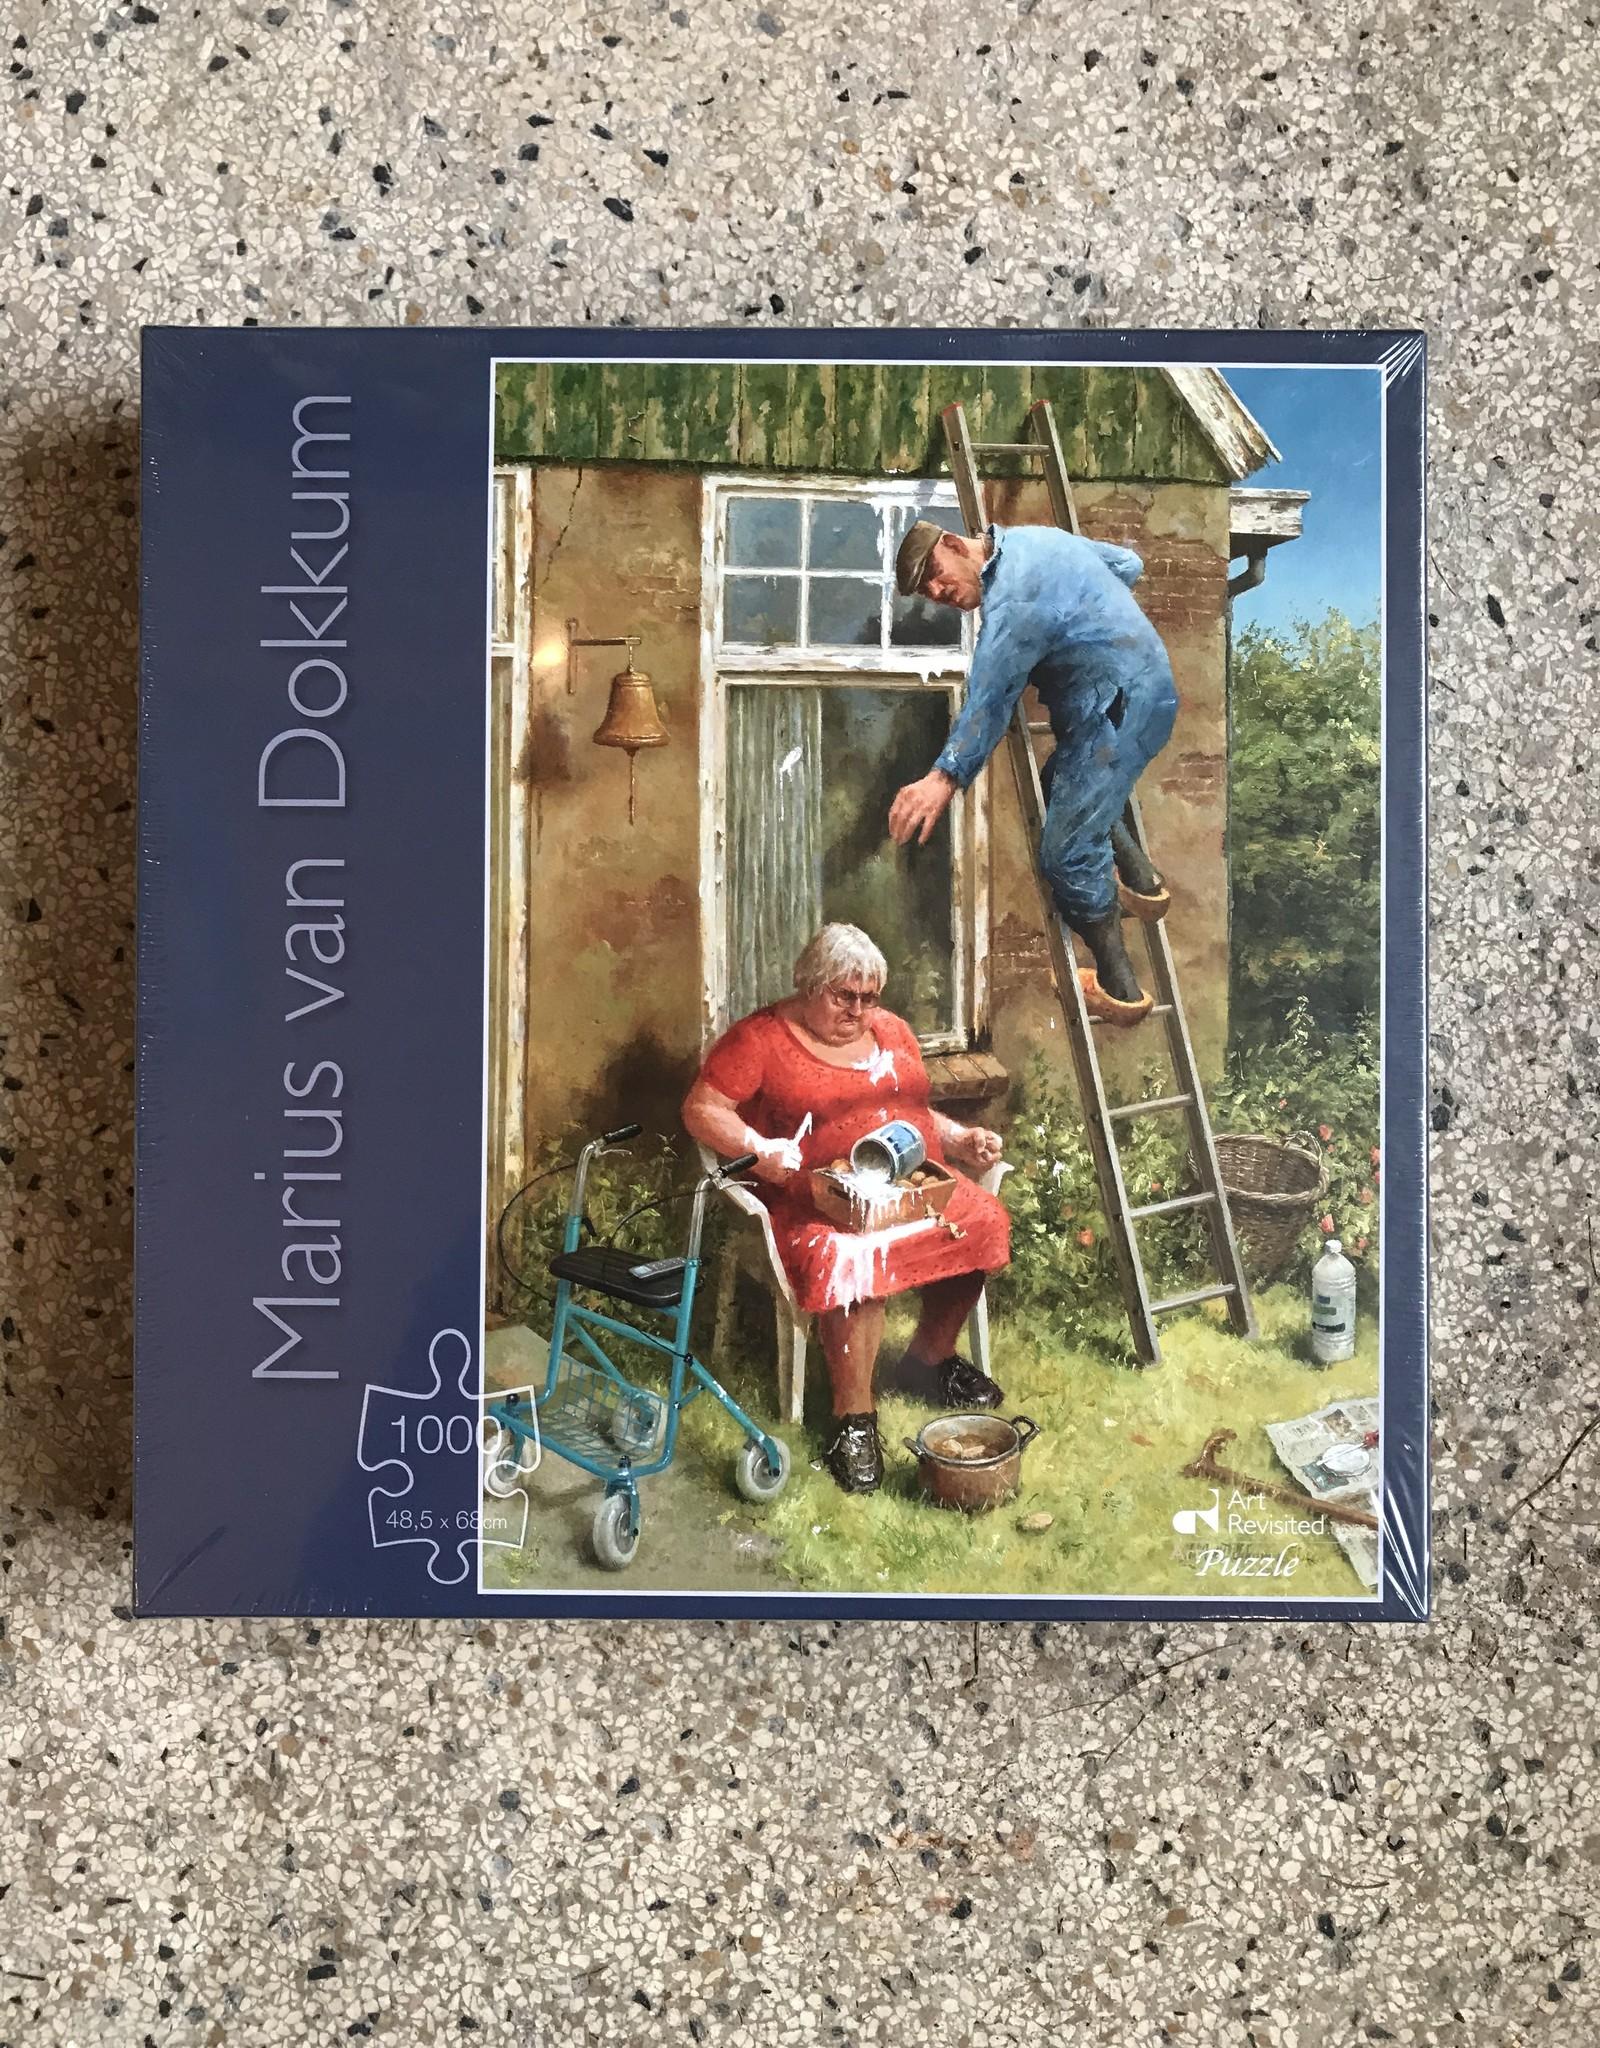 Art Revisited Marius van Dokkum  puzzle 'Do it yourself'  1000 pieces